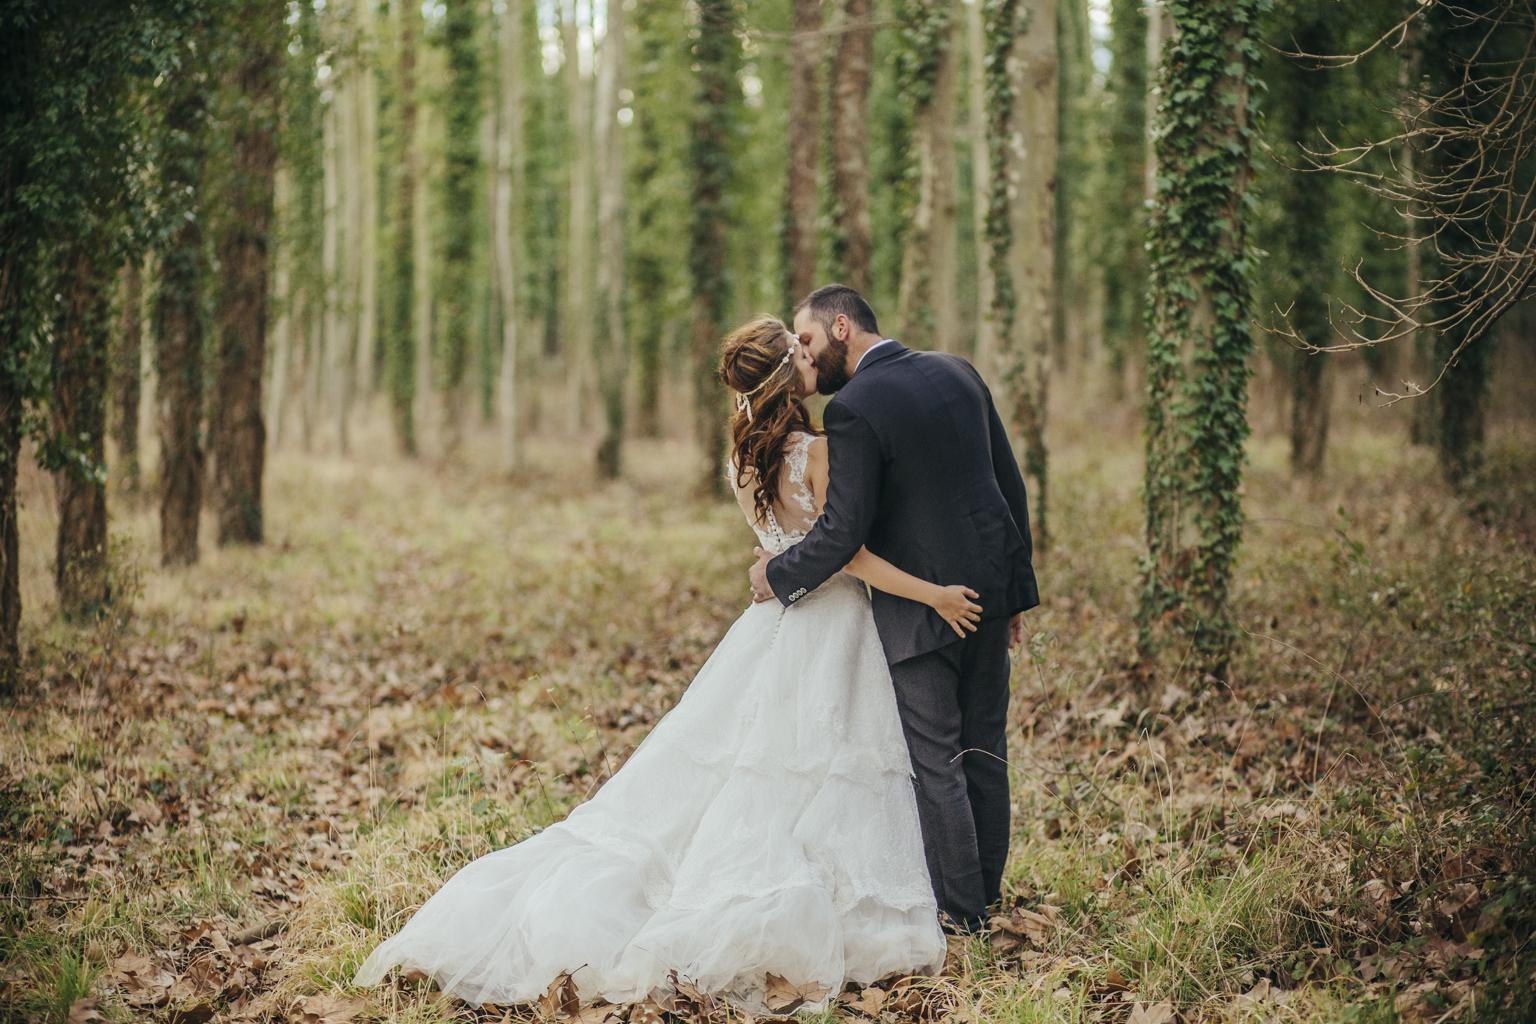 Fotógrafo bodas barcelona postboda :: postboda en el bosque :: boda en invierno